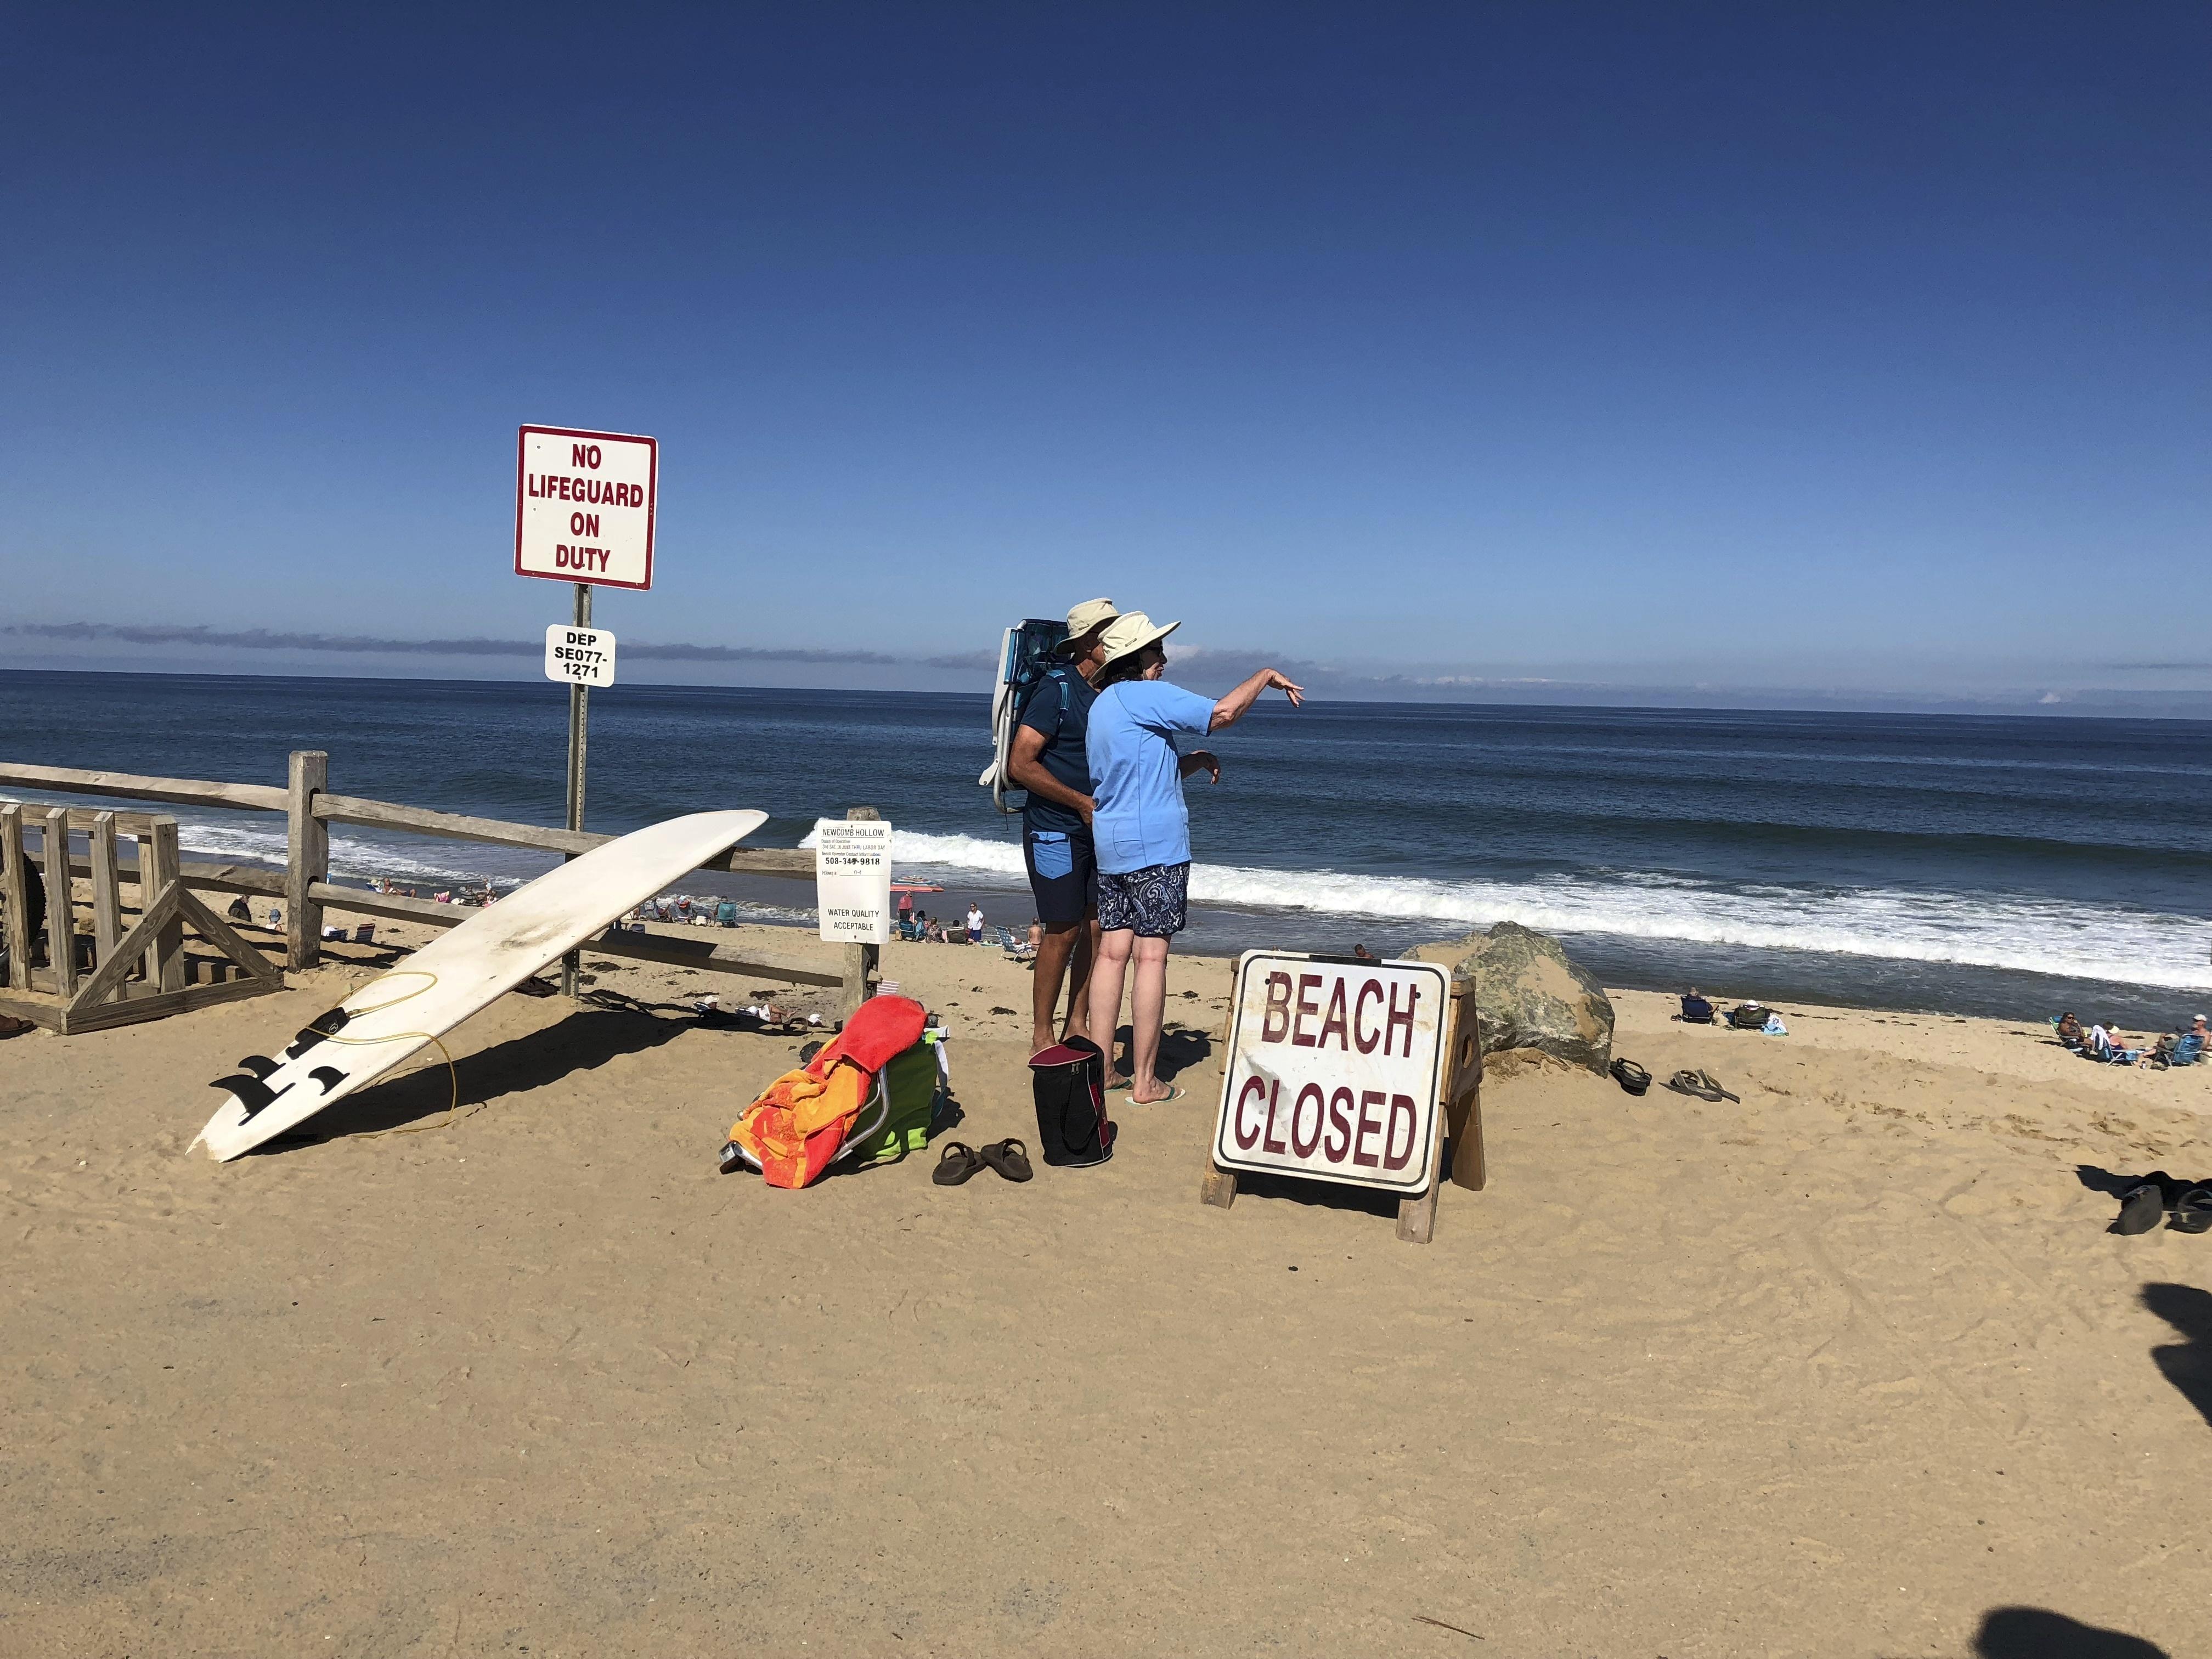 Revere man killed in shark attack at Wellfleet beach